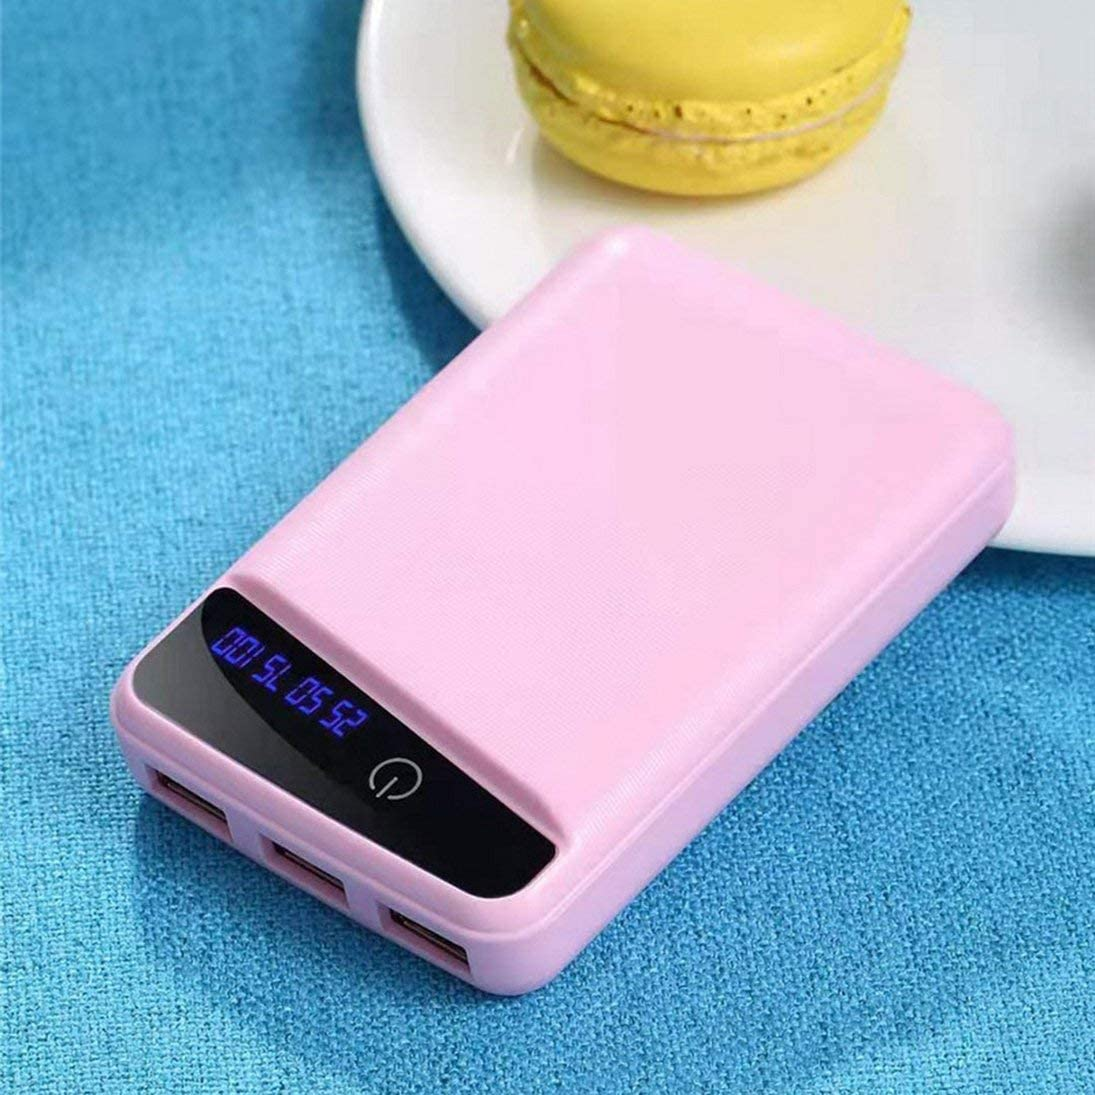 18650 DIY Battery Bank Caja de la Caja de la Carcasa de la batería 3USB Kit de Bricolaje Pantalla LCD Digital Shell (Rosa) ToGames-ES: Amazon.es: Electrónica